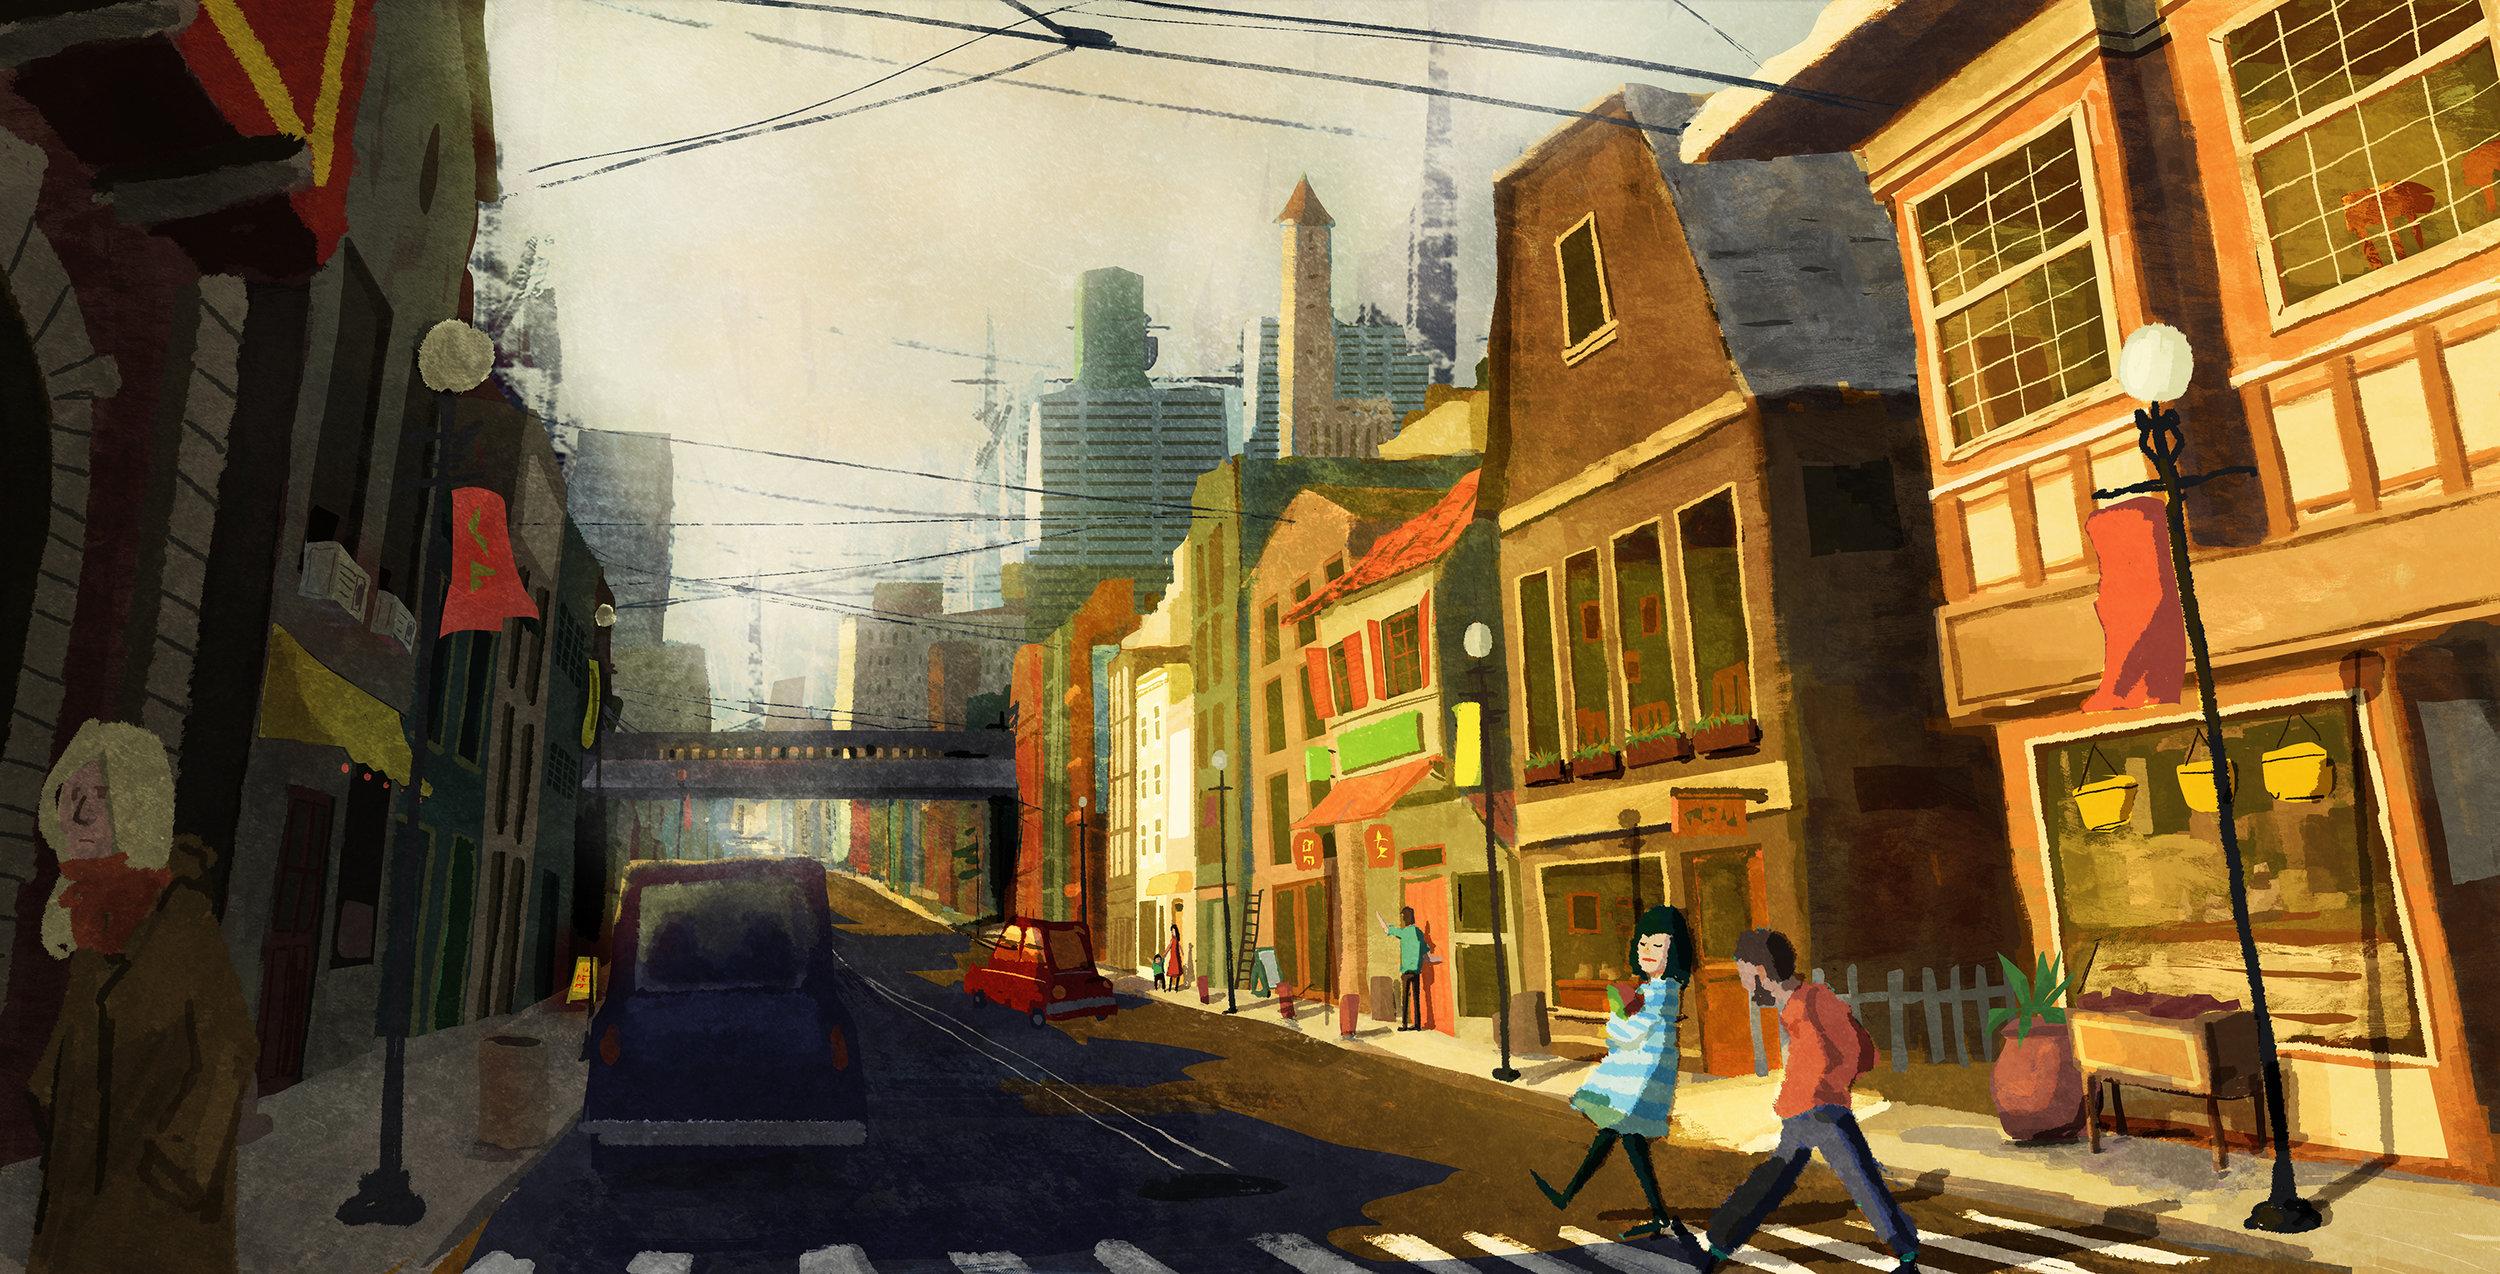 city street.jpg